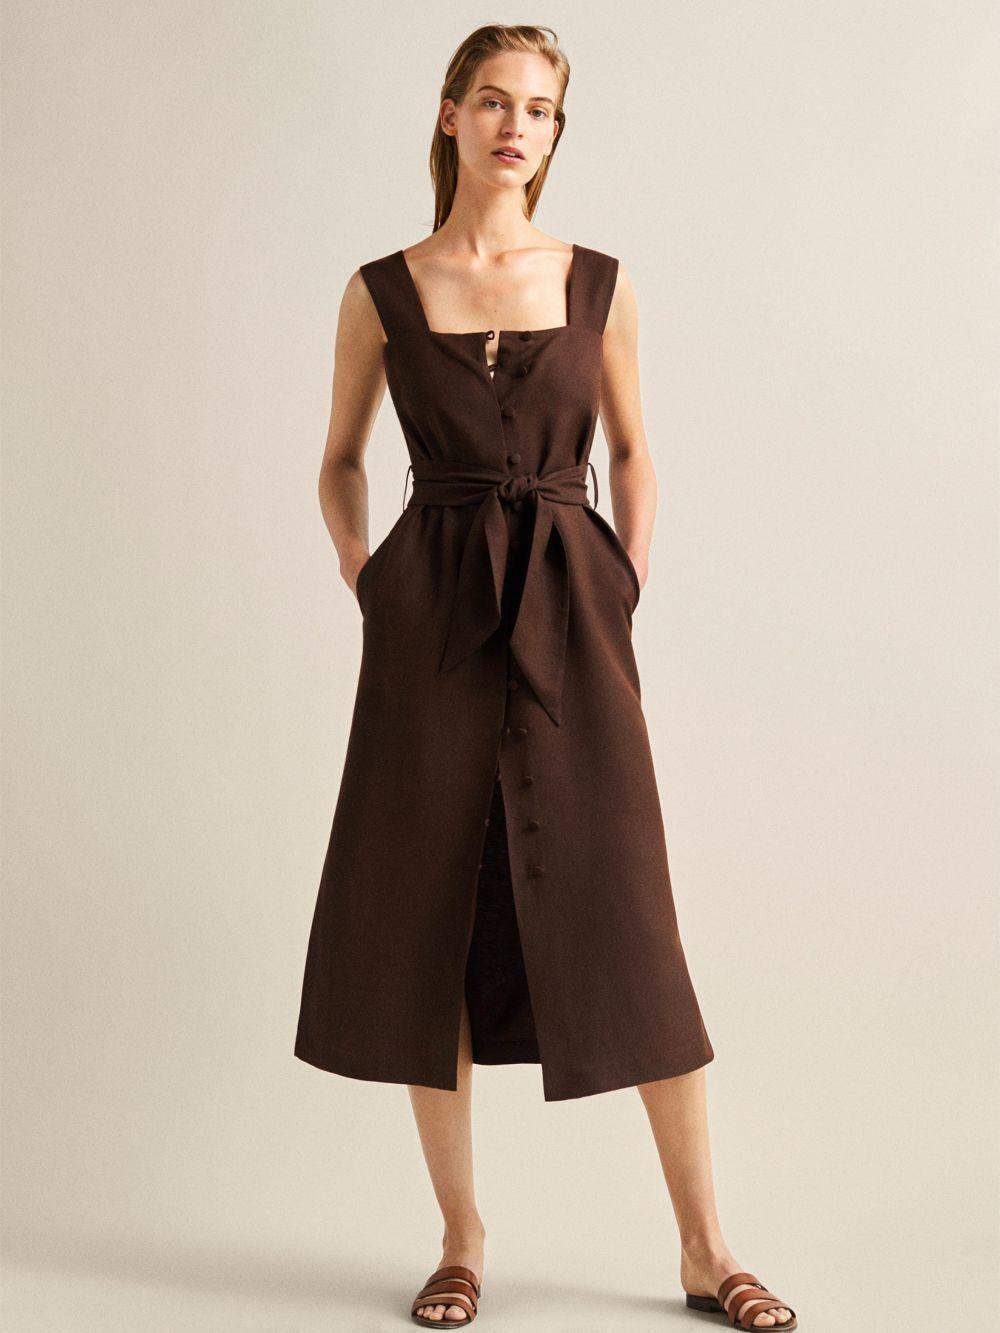 Vestido con botones y lazo, de Massimo Dutti (89,95 euros).